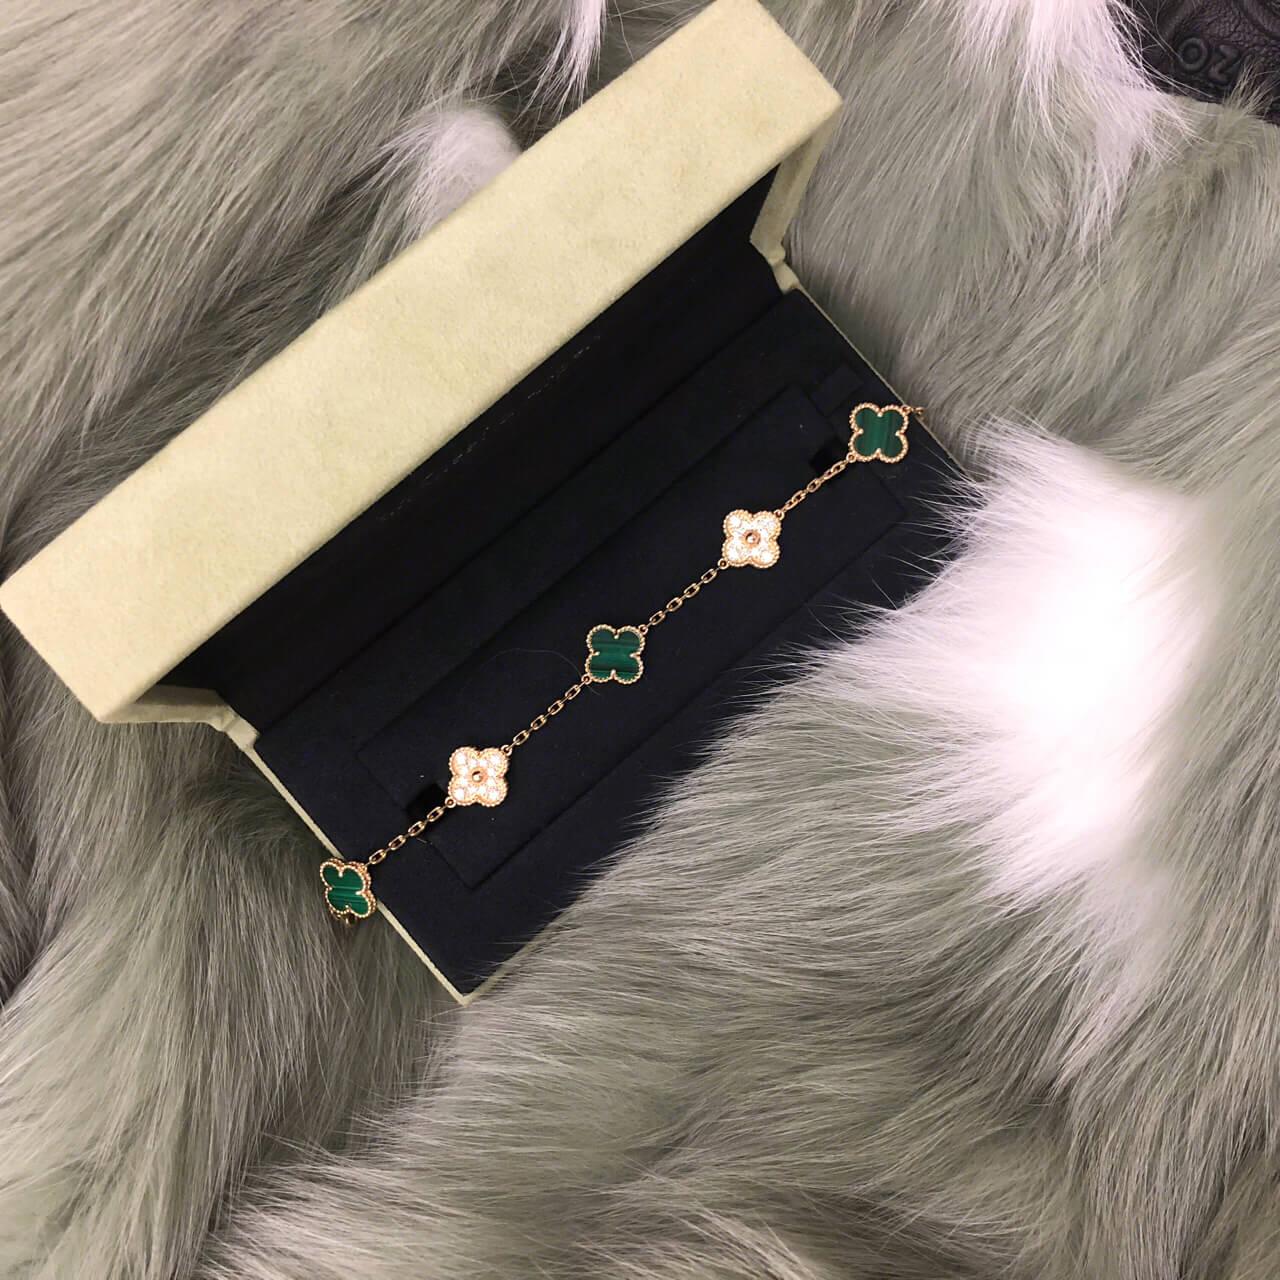 fake van cleef & arpels Vintage Alhambra bracelet 5 motifs